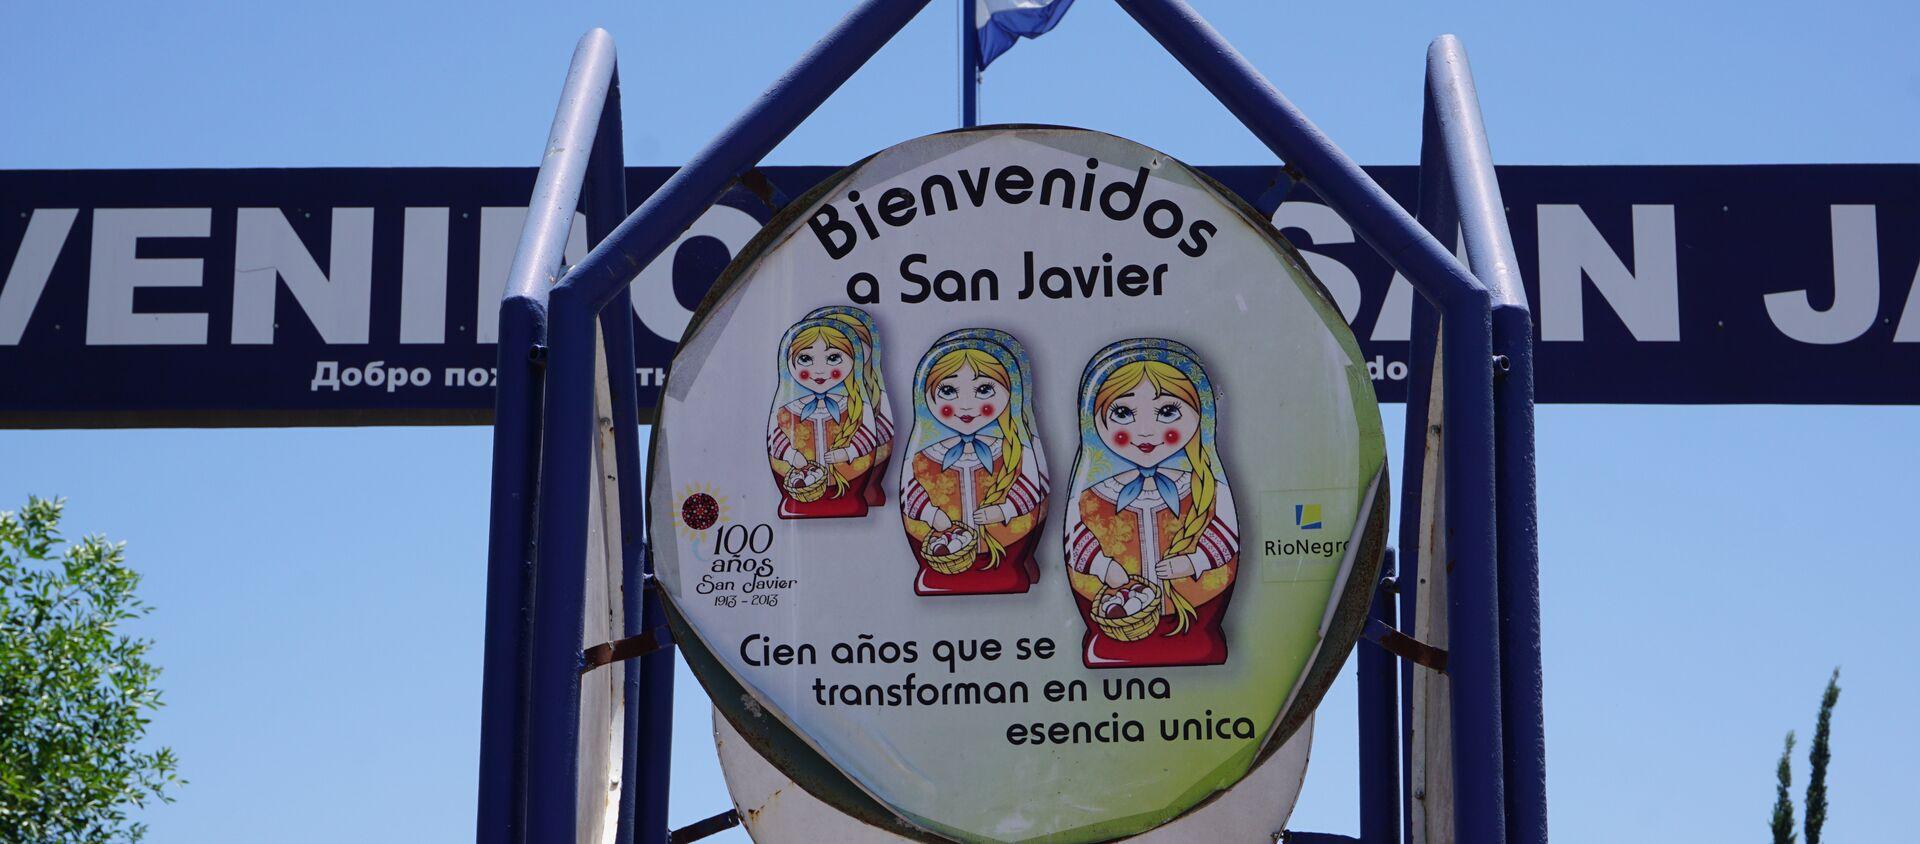 San Javier, Río Negro, Uruguay - Sputnik Mundo, 1920, 15.02.2017